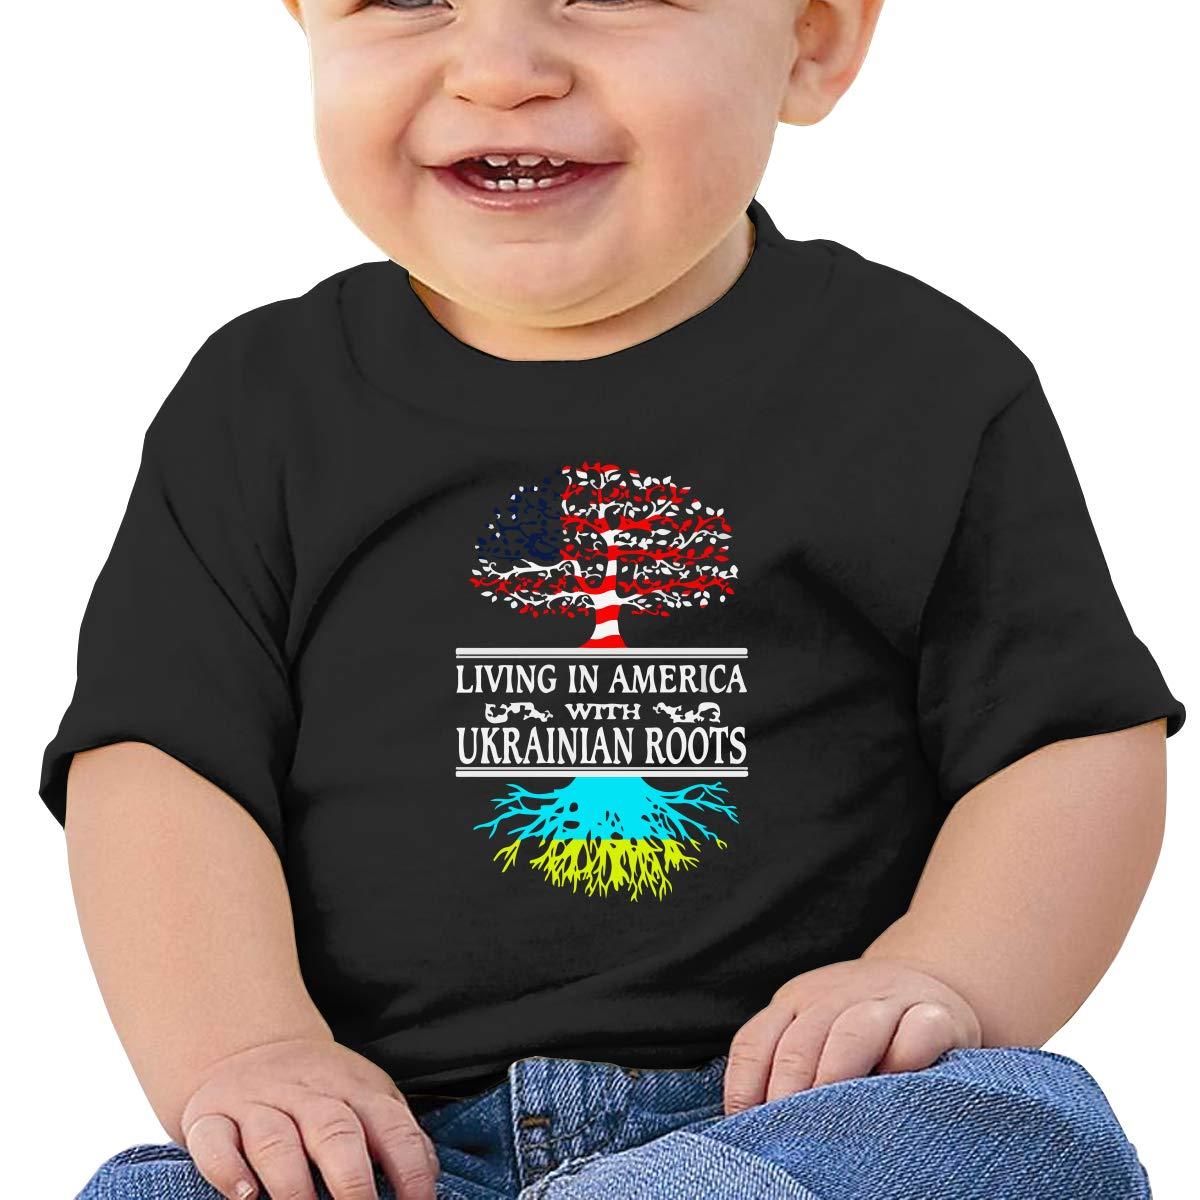 Living in America Ukrainian Roots Baby Boys Girls Short Sleeve Crew Neck T-Shirt 6-18 Month Tops